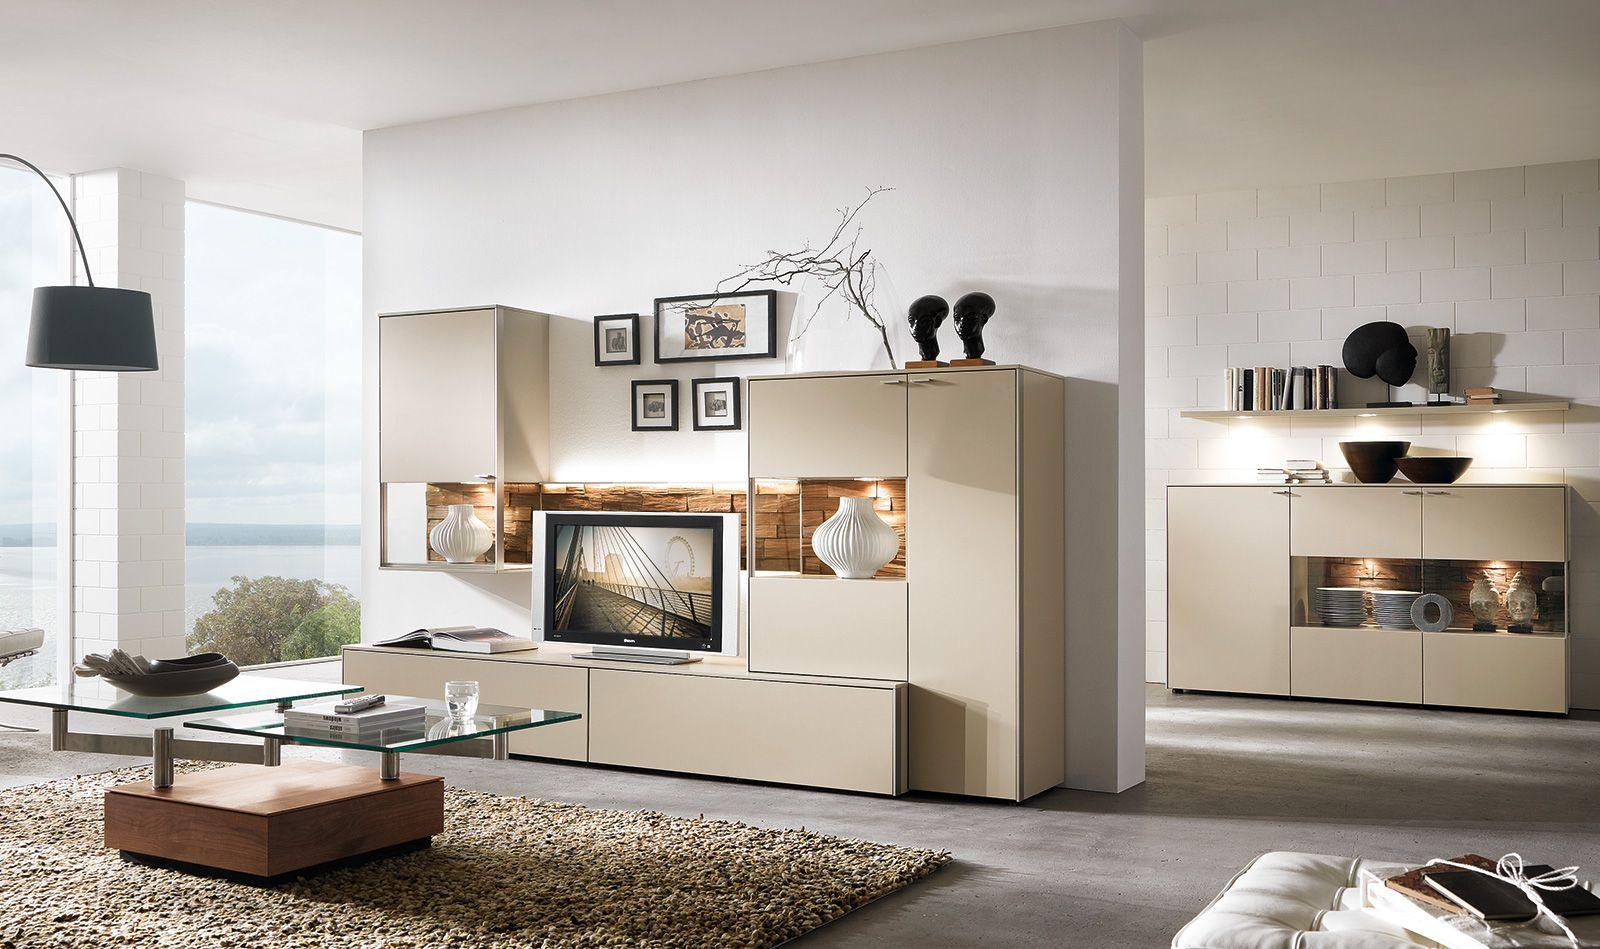 sentino - Programme - Wohnzimmer - Venjakob Möbel | Furniture ...